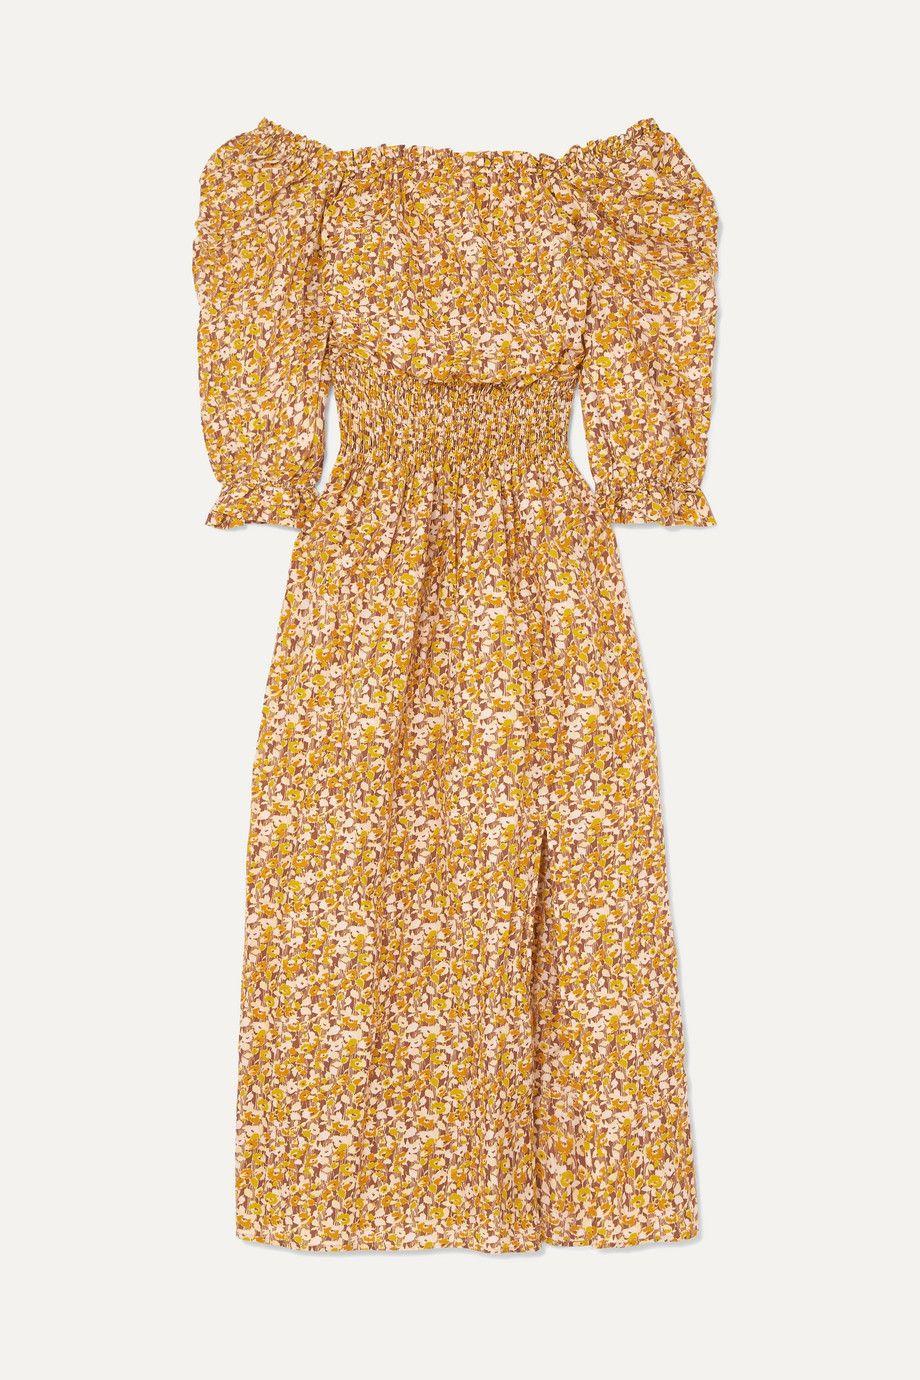 Rixo Off-the-Shoulder Floral Print Dress